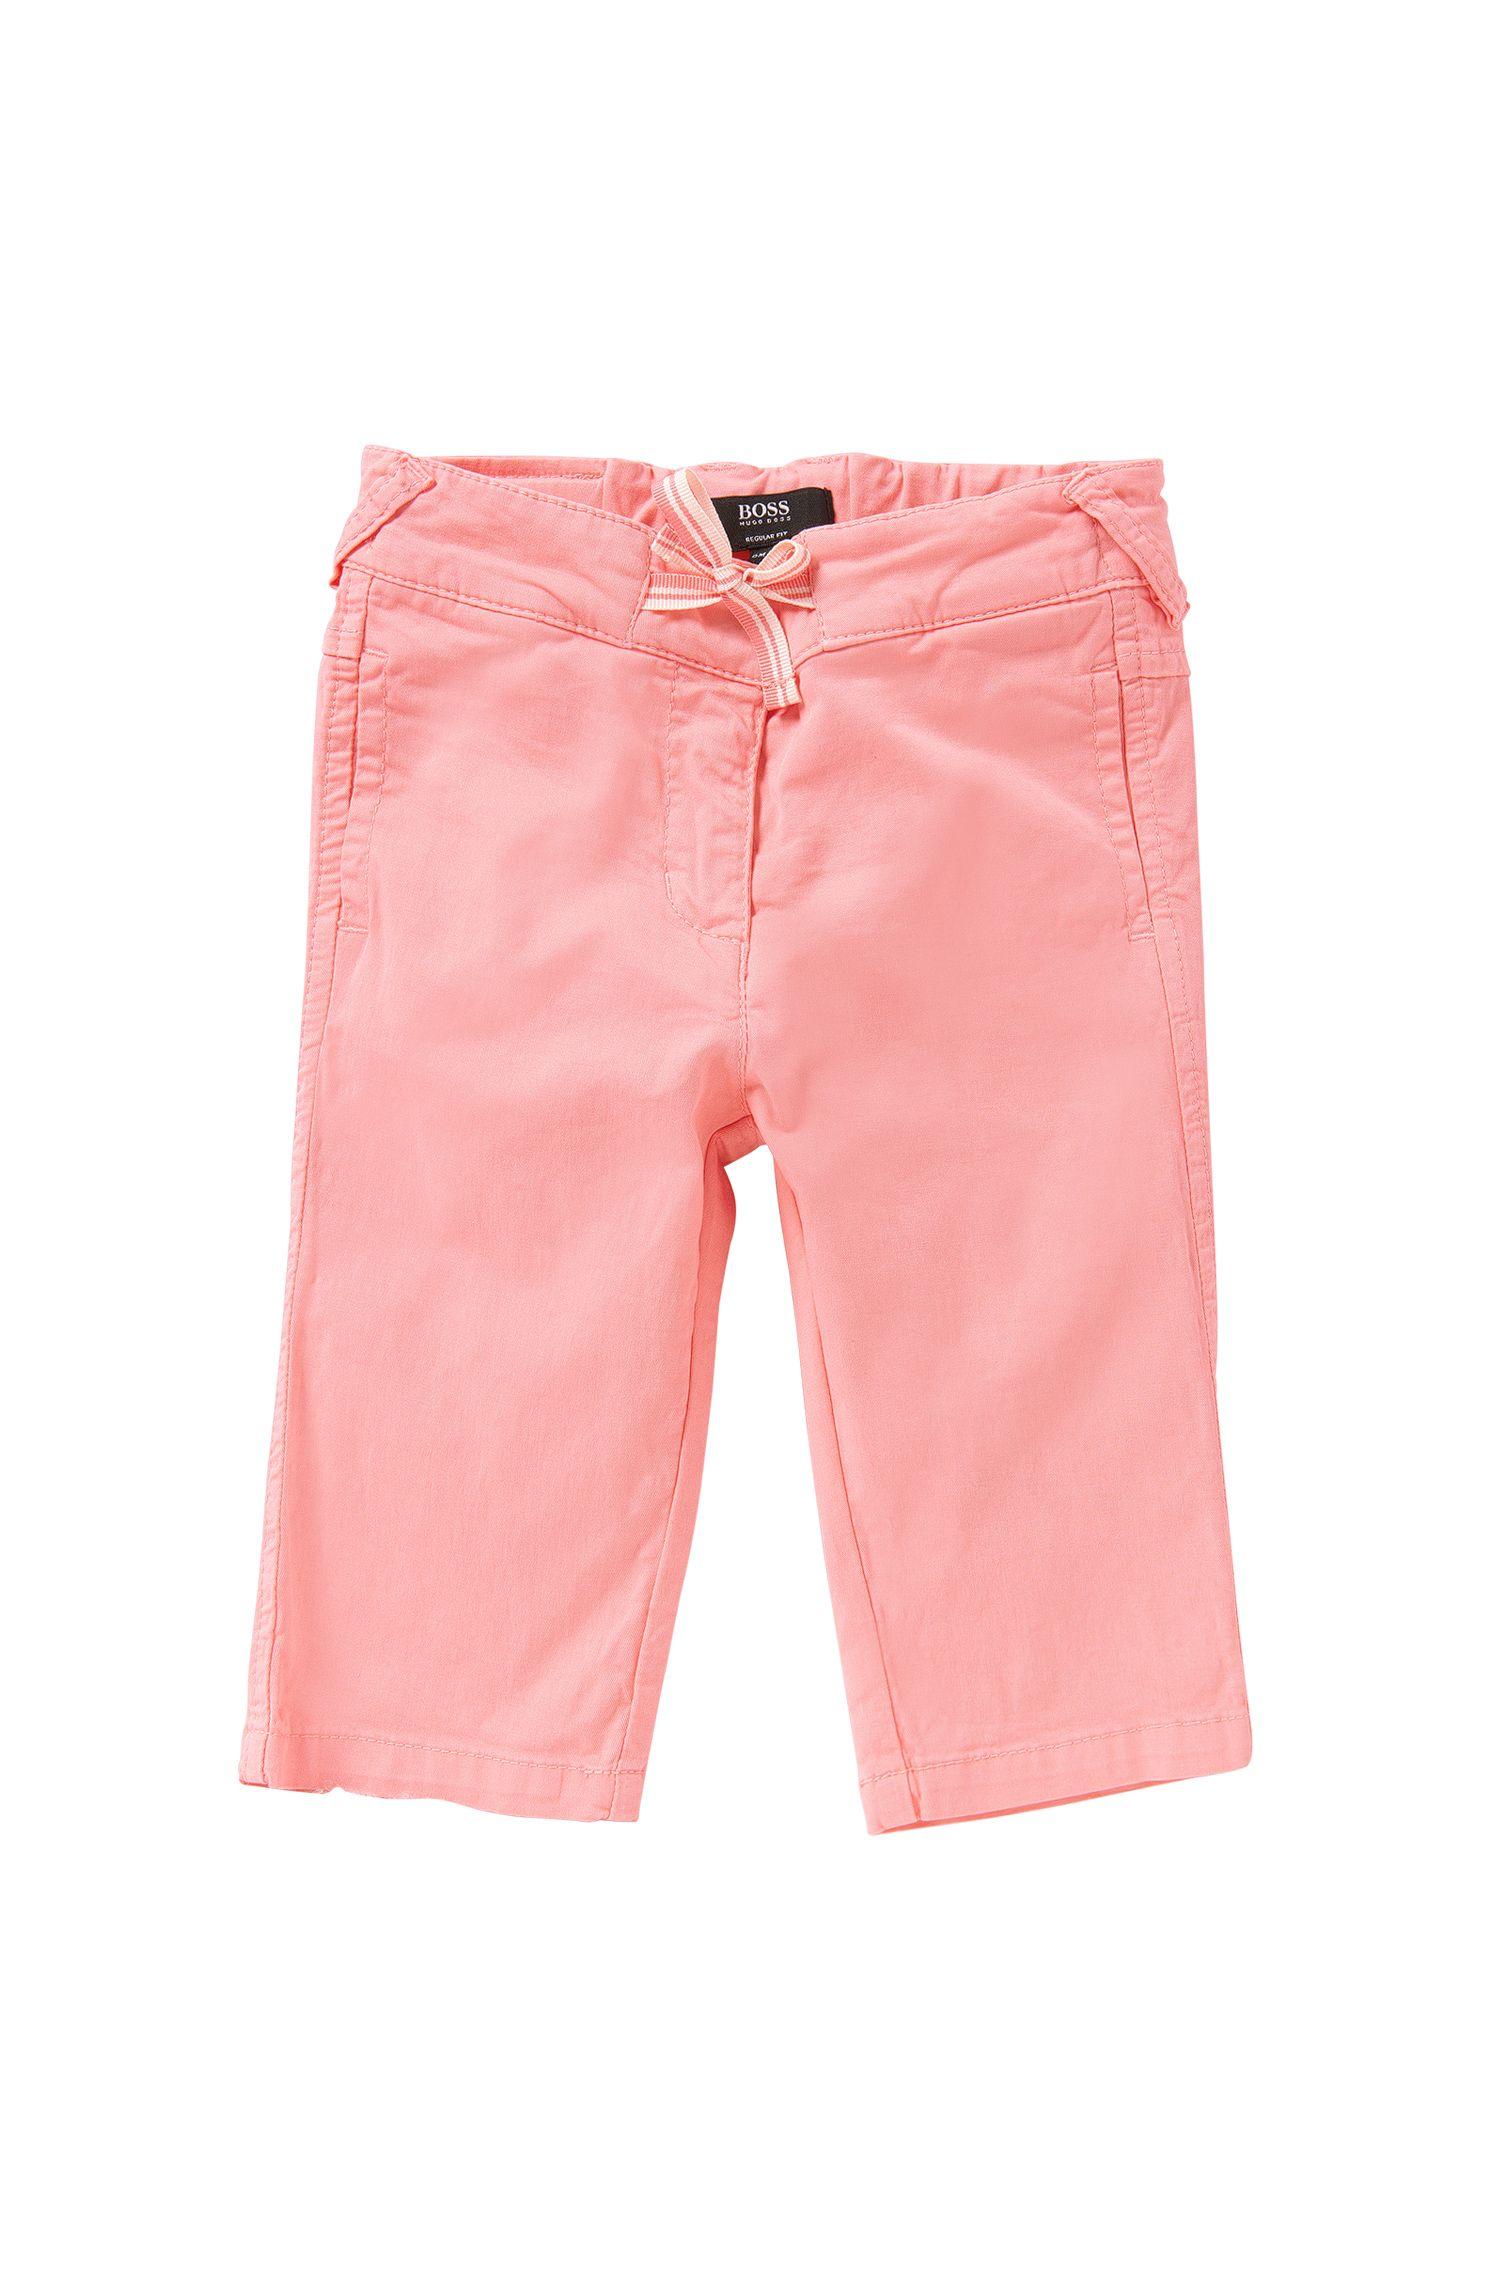 Pantalón para bebé en algodón elástico con cinta para anudar decorativa: 'J04232'